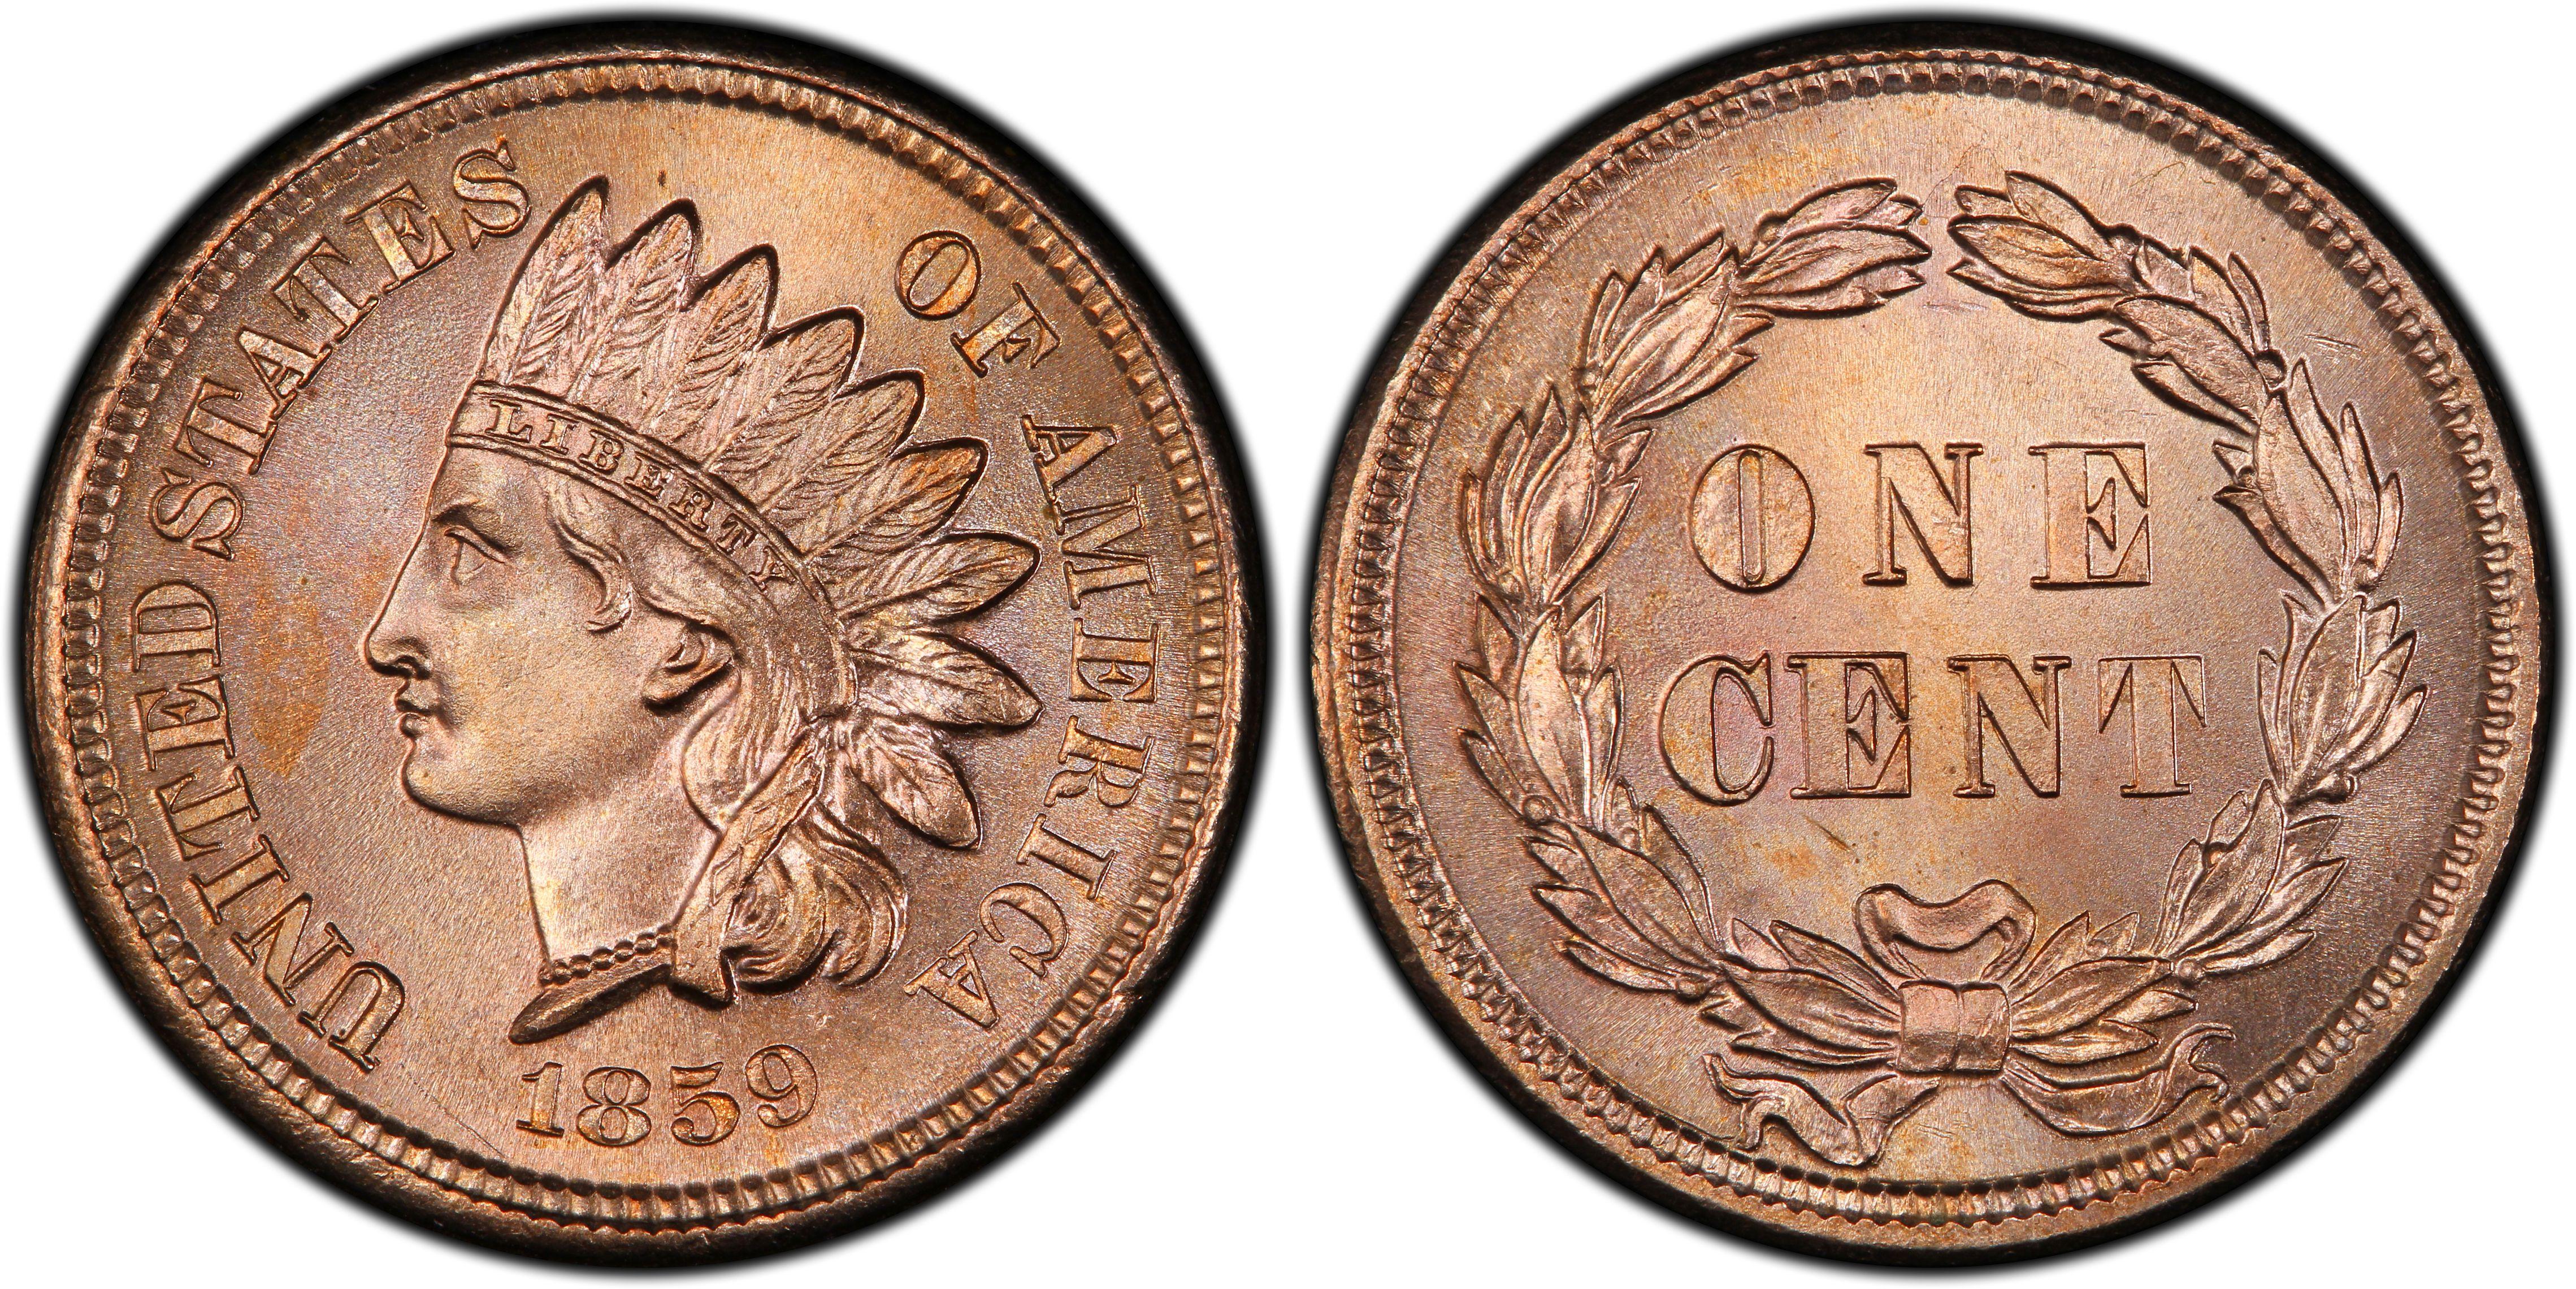 1859 Indian Head Copper Nickel Cent Various Grades